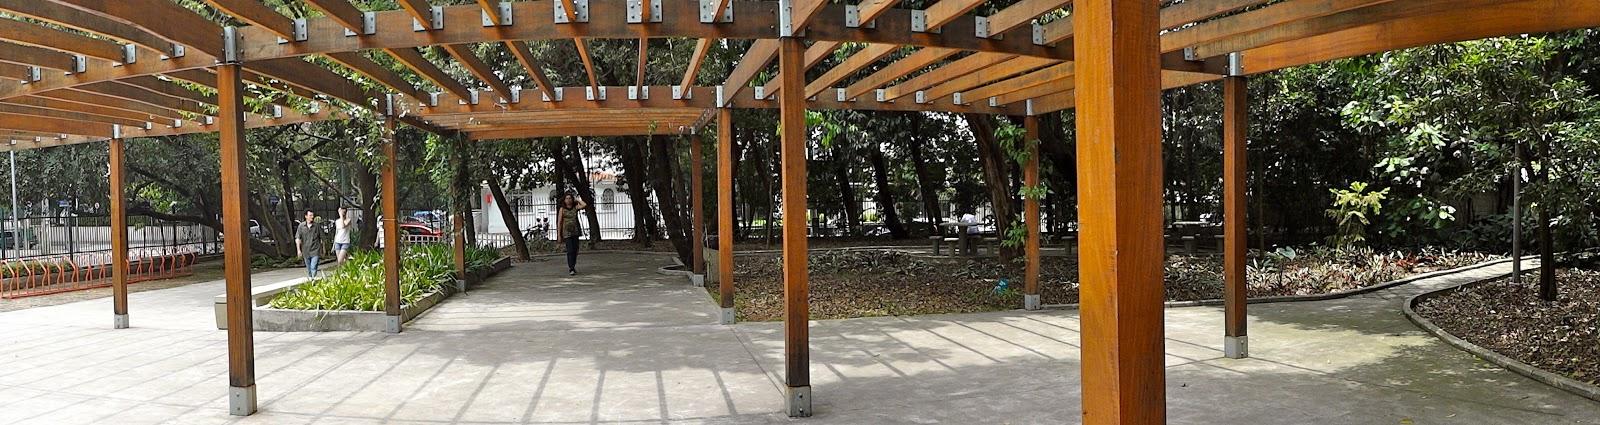 DSC00110 2 - Série Avenida Paulista: a Villa Fortunata e o parque. Como é o nome mesmo?